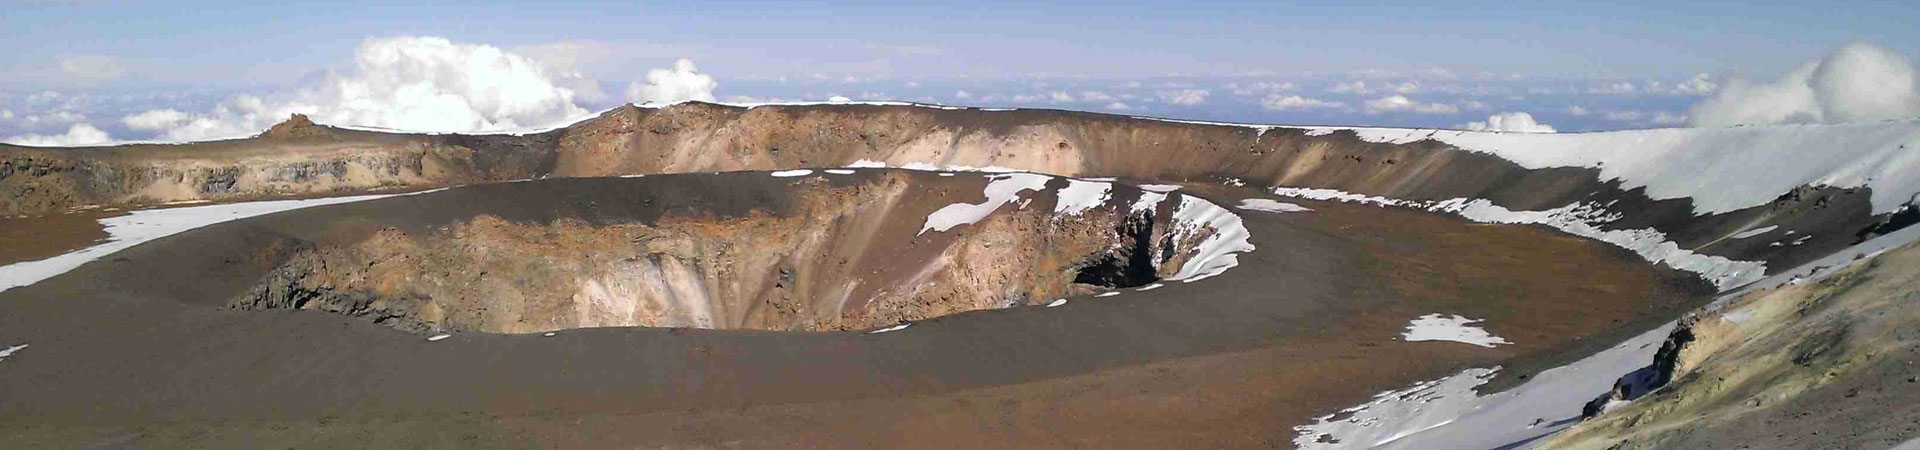 9-Days-Climbing-Kilimanjaro-via-Lemosho-Crater-Route